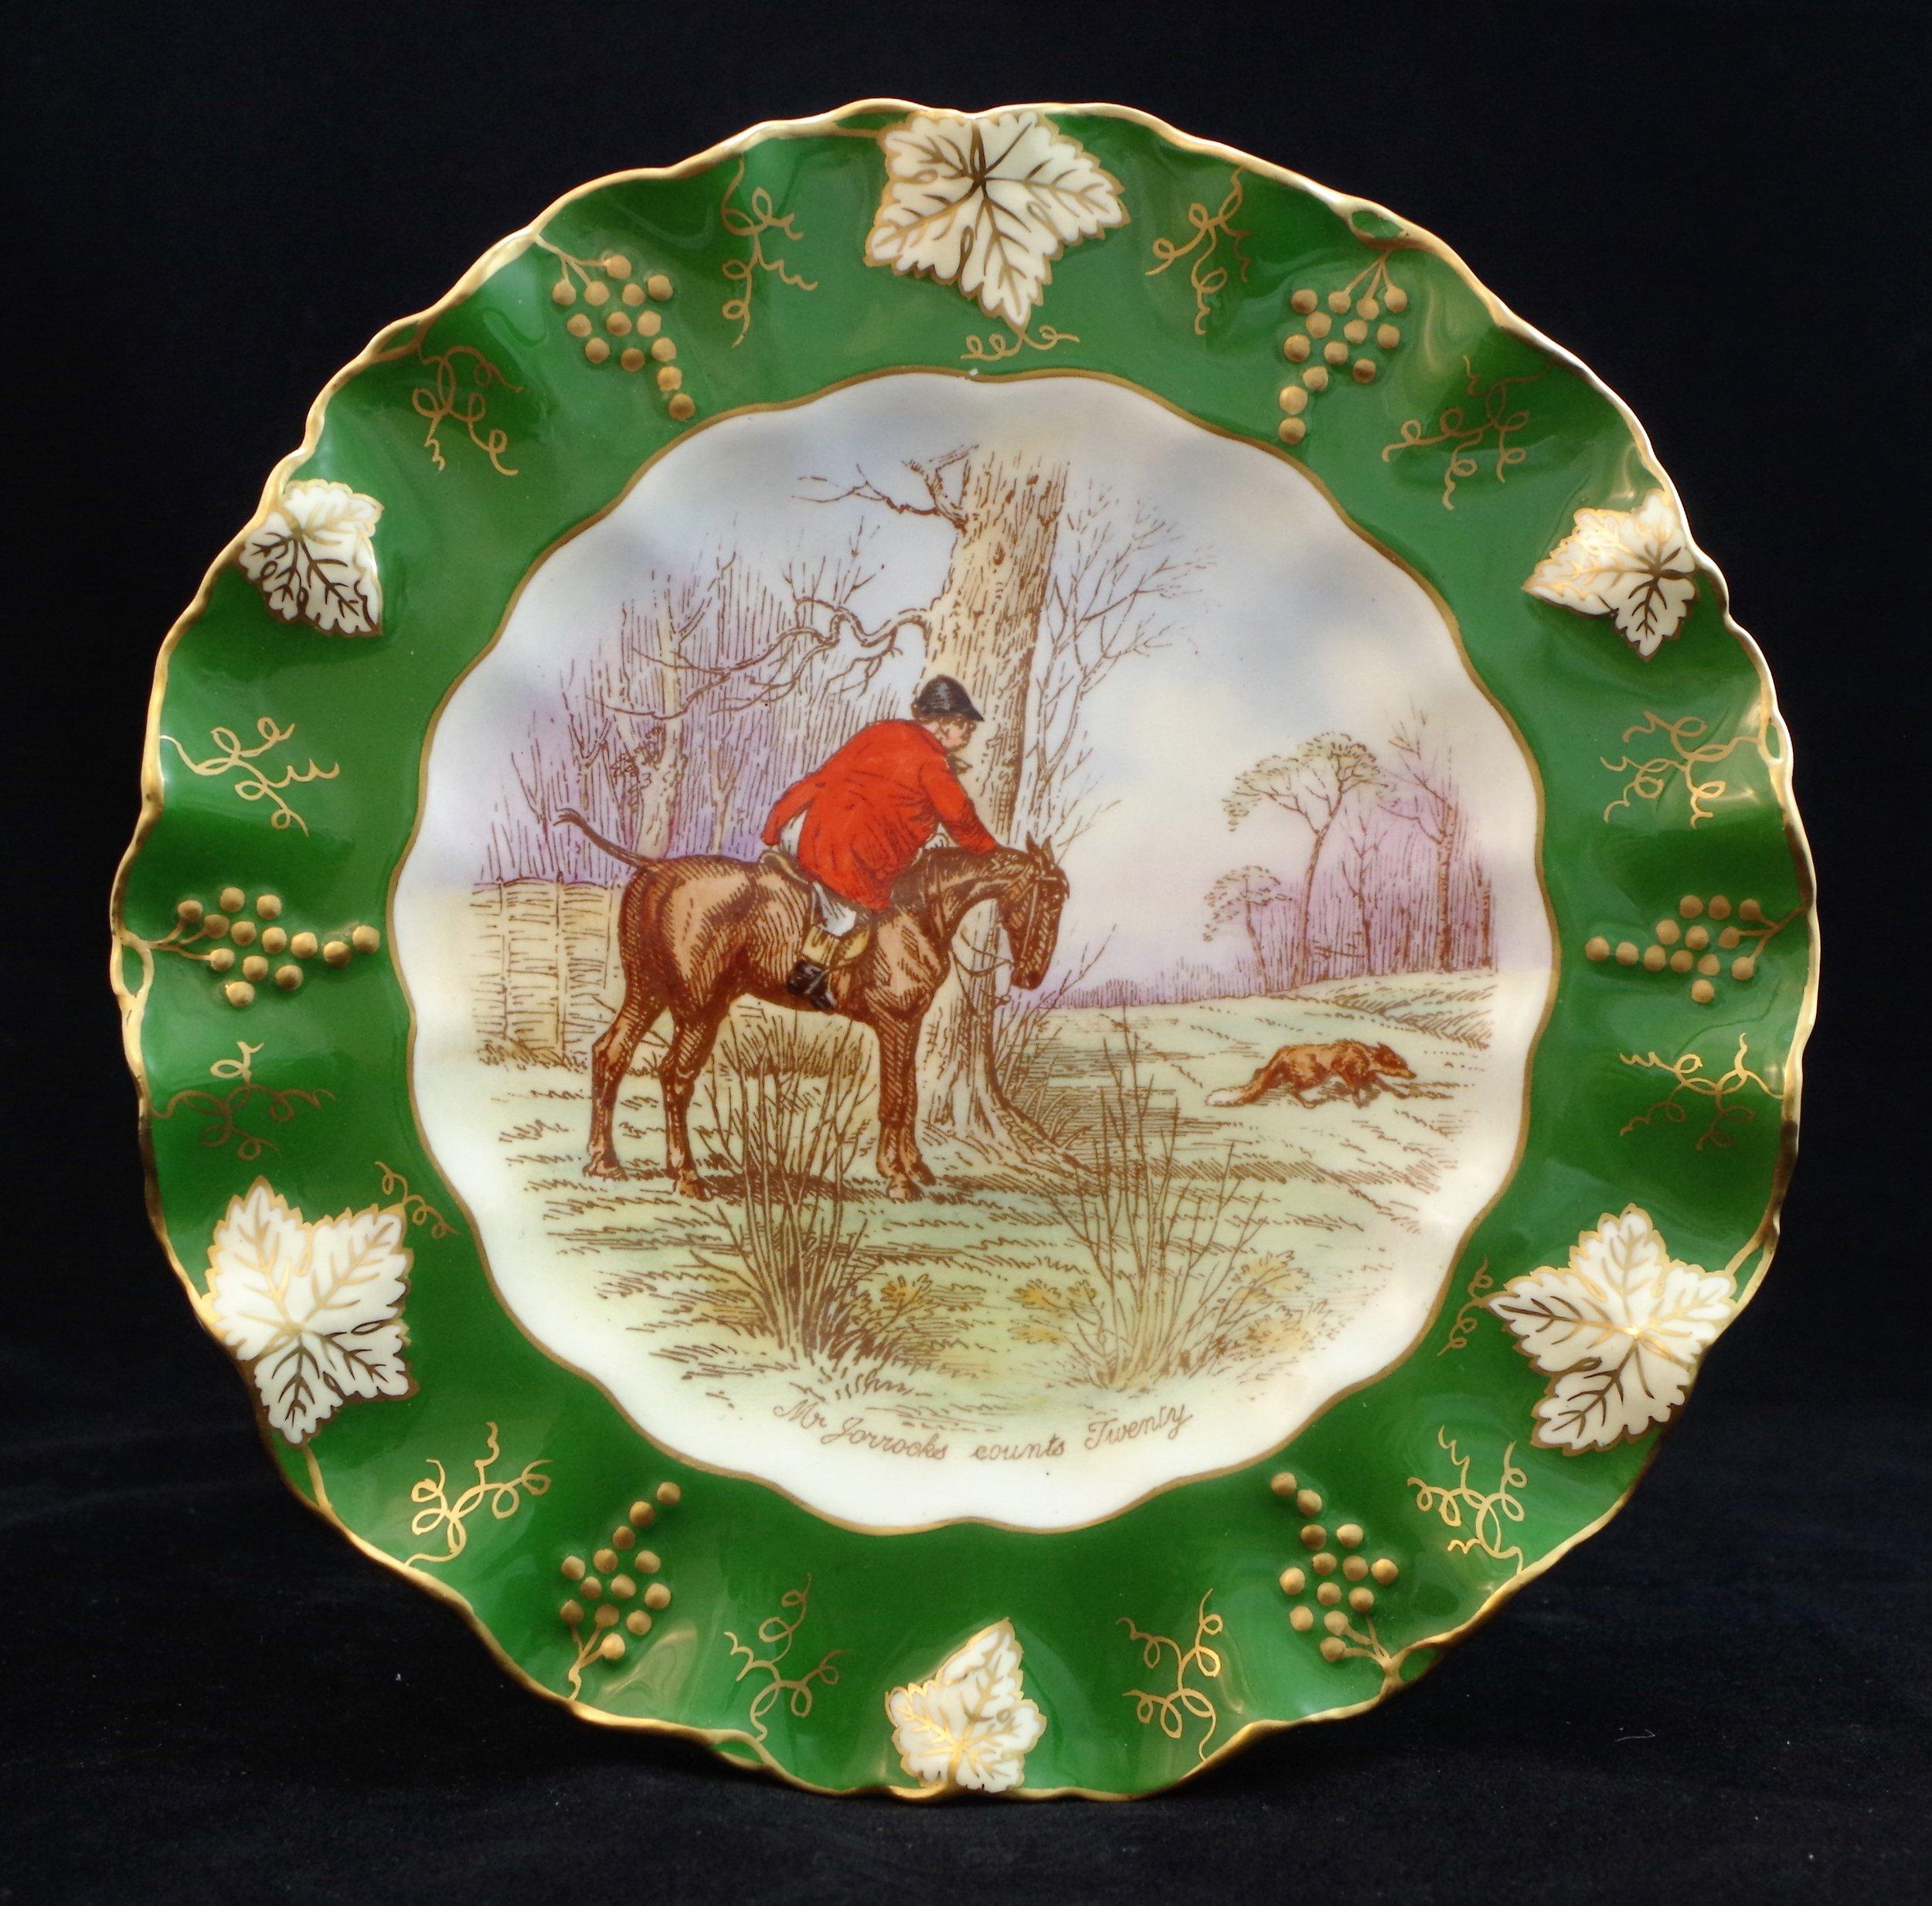 royal-crown-derby-vine-siam-green-ground-jorrocks-4